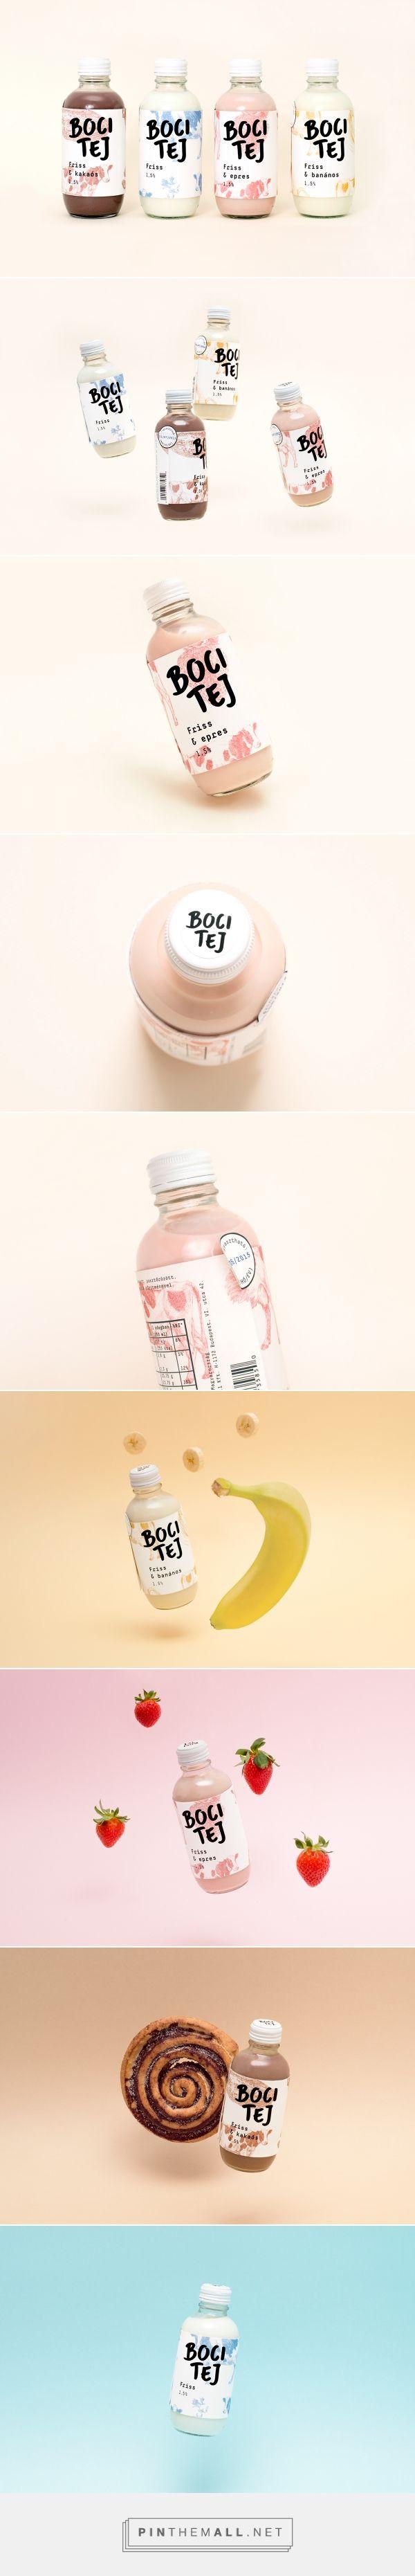 Boci Tej / Milk Packaging / by Nóra Rohmann > https://www.behance.net/gallery/26646487/Boci-Tej-Milk-Packaging